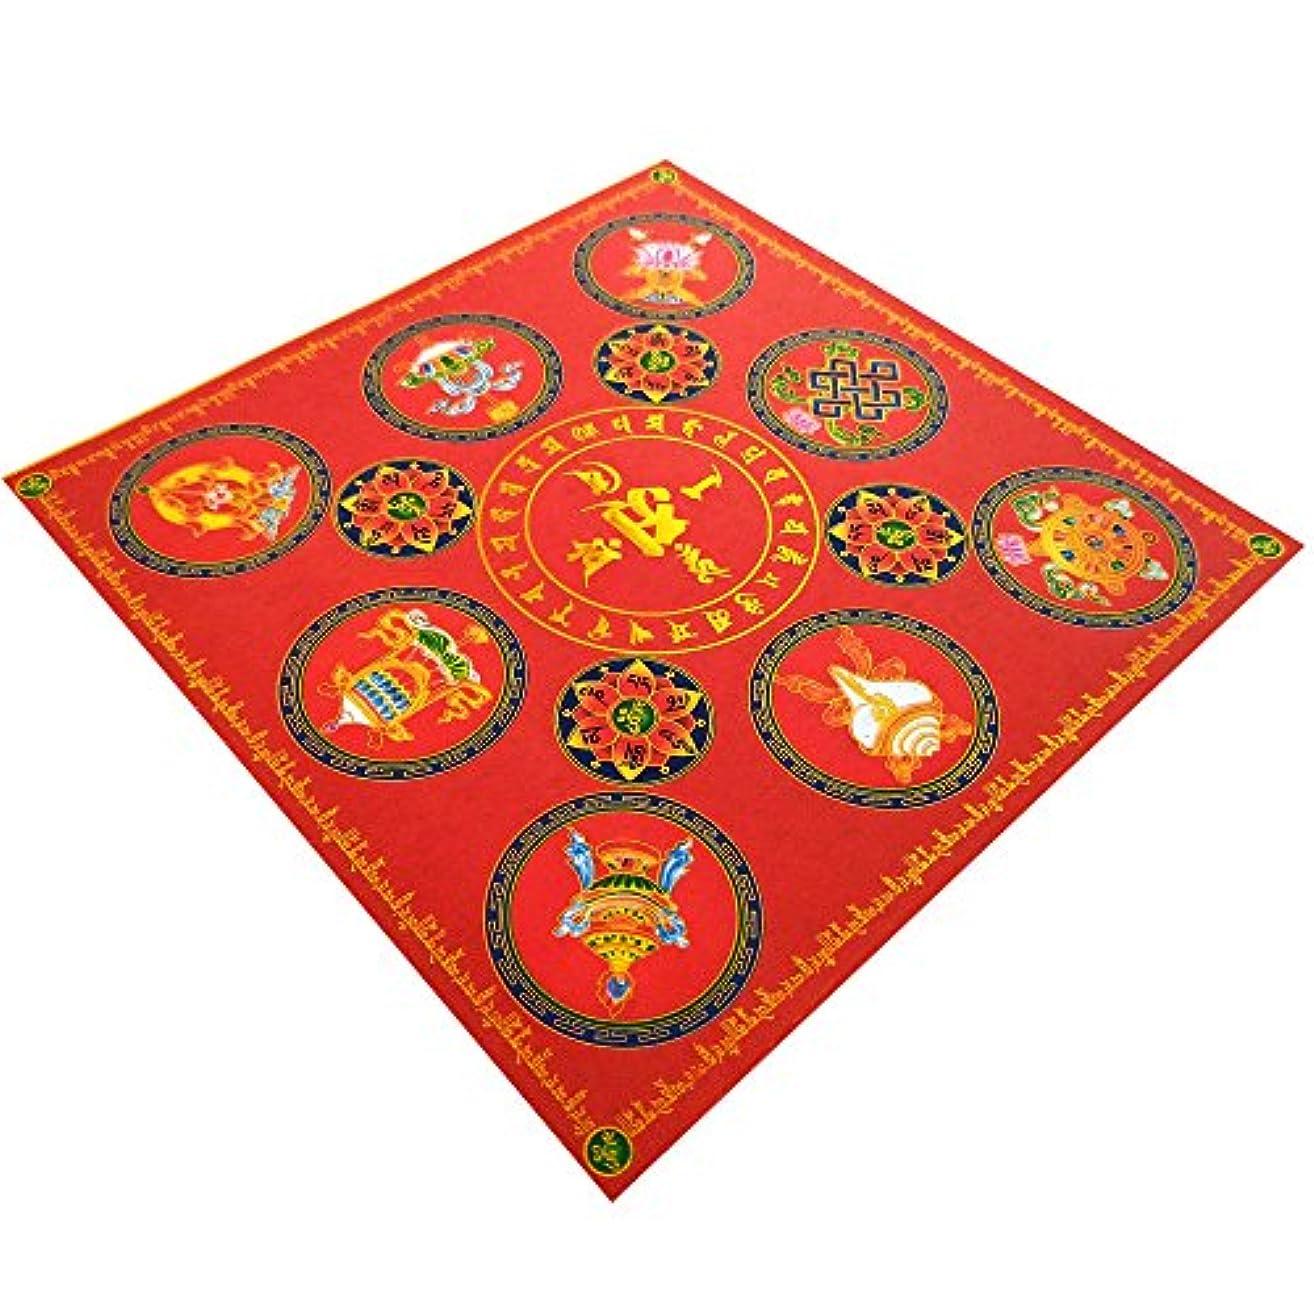 zeestar祖先Incense用紙/ゴーストお金の祖先Praying 7.6インチx 7.6インチ、40個 – 吉祥(Lotus